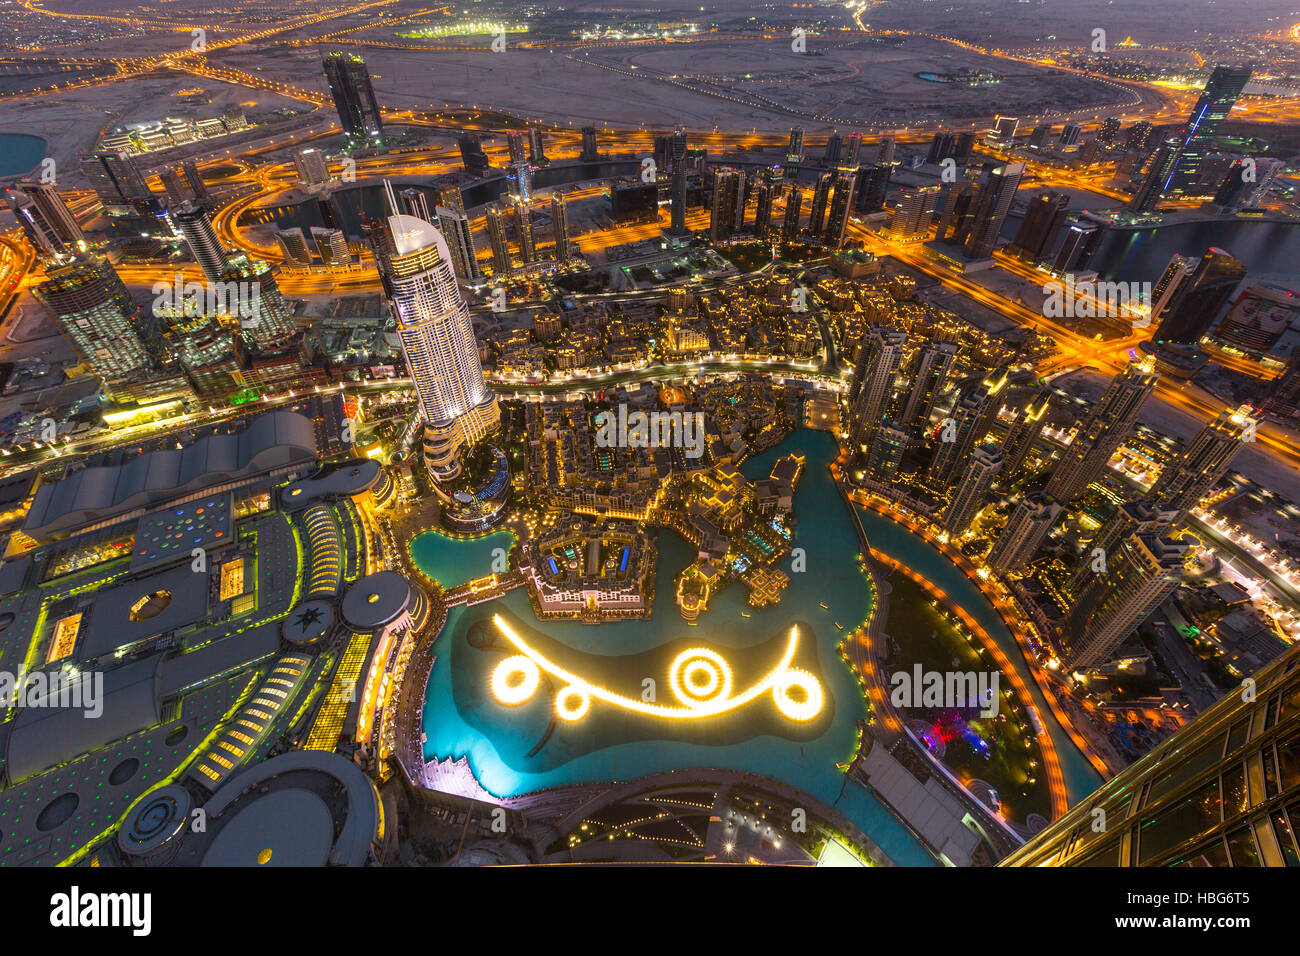 View from Burj Khalifa observation deck, Dubai Fountain, The Address Downtown Burj, Dubai Mall and Souk Al Bahar, - Stock Image